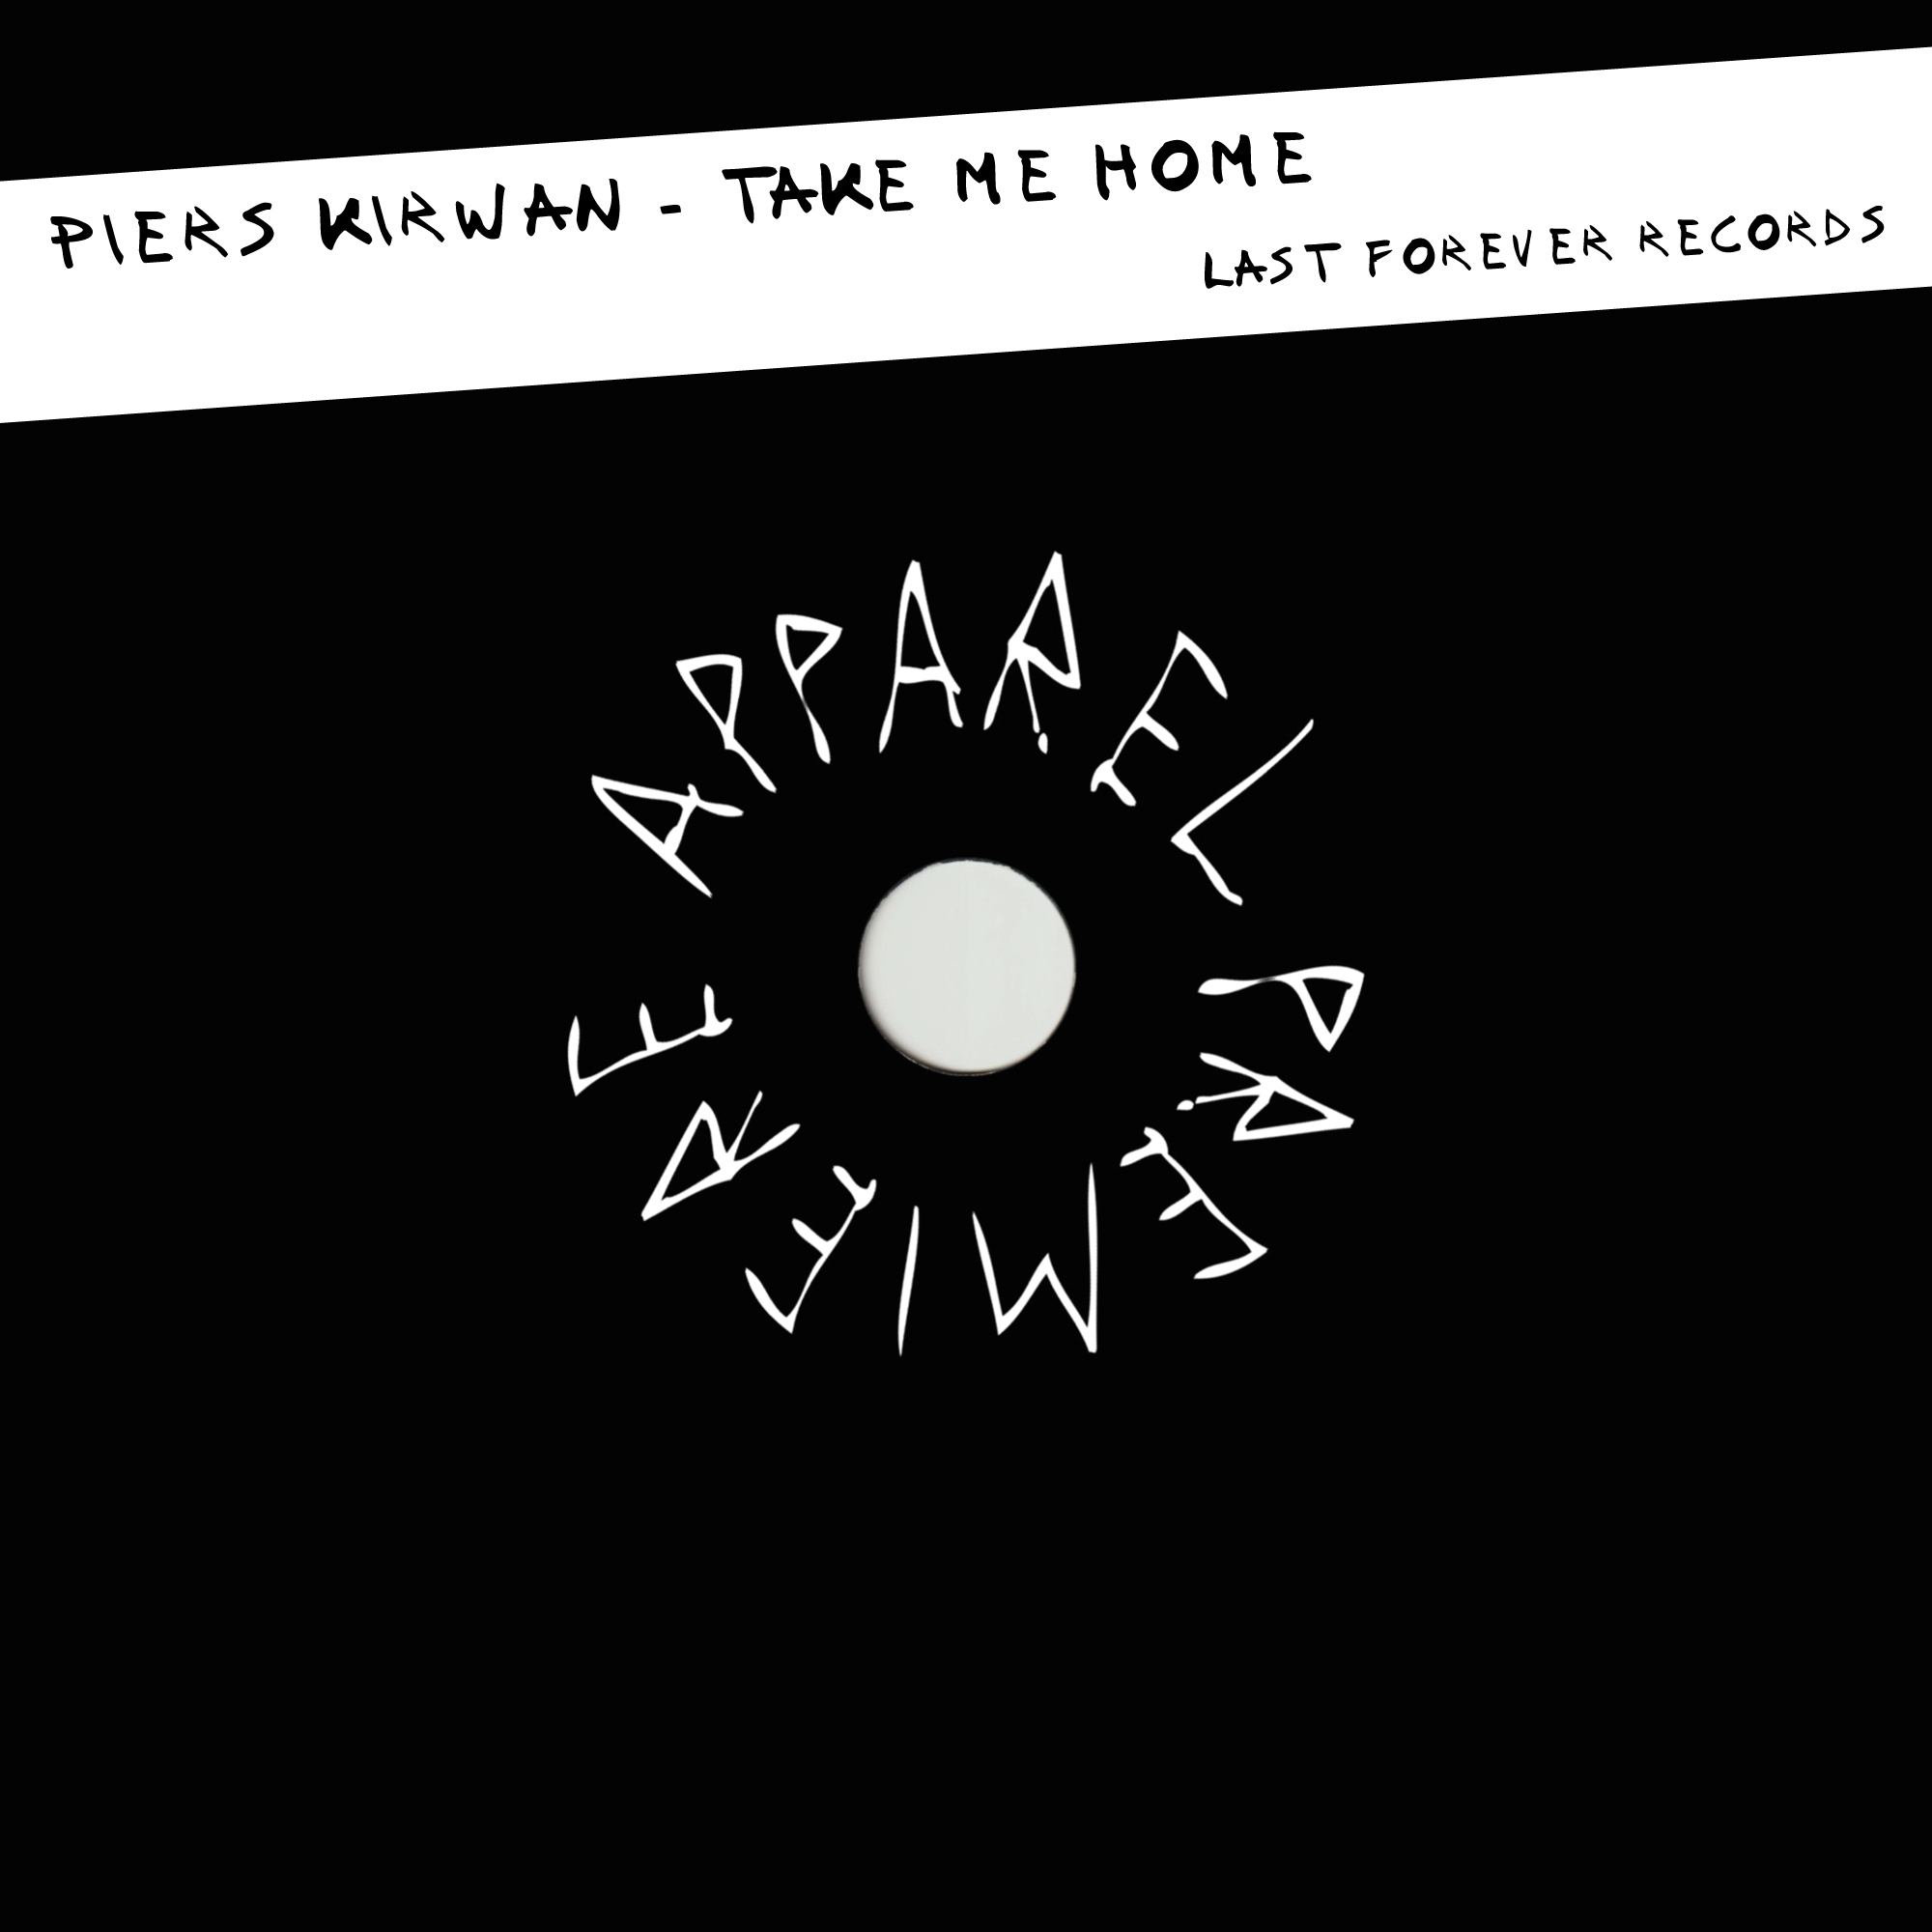 APPAREL PREMIERE: Piers Kirwan – Take Me Home [Last Forever Records]